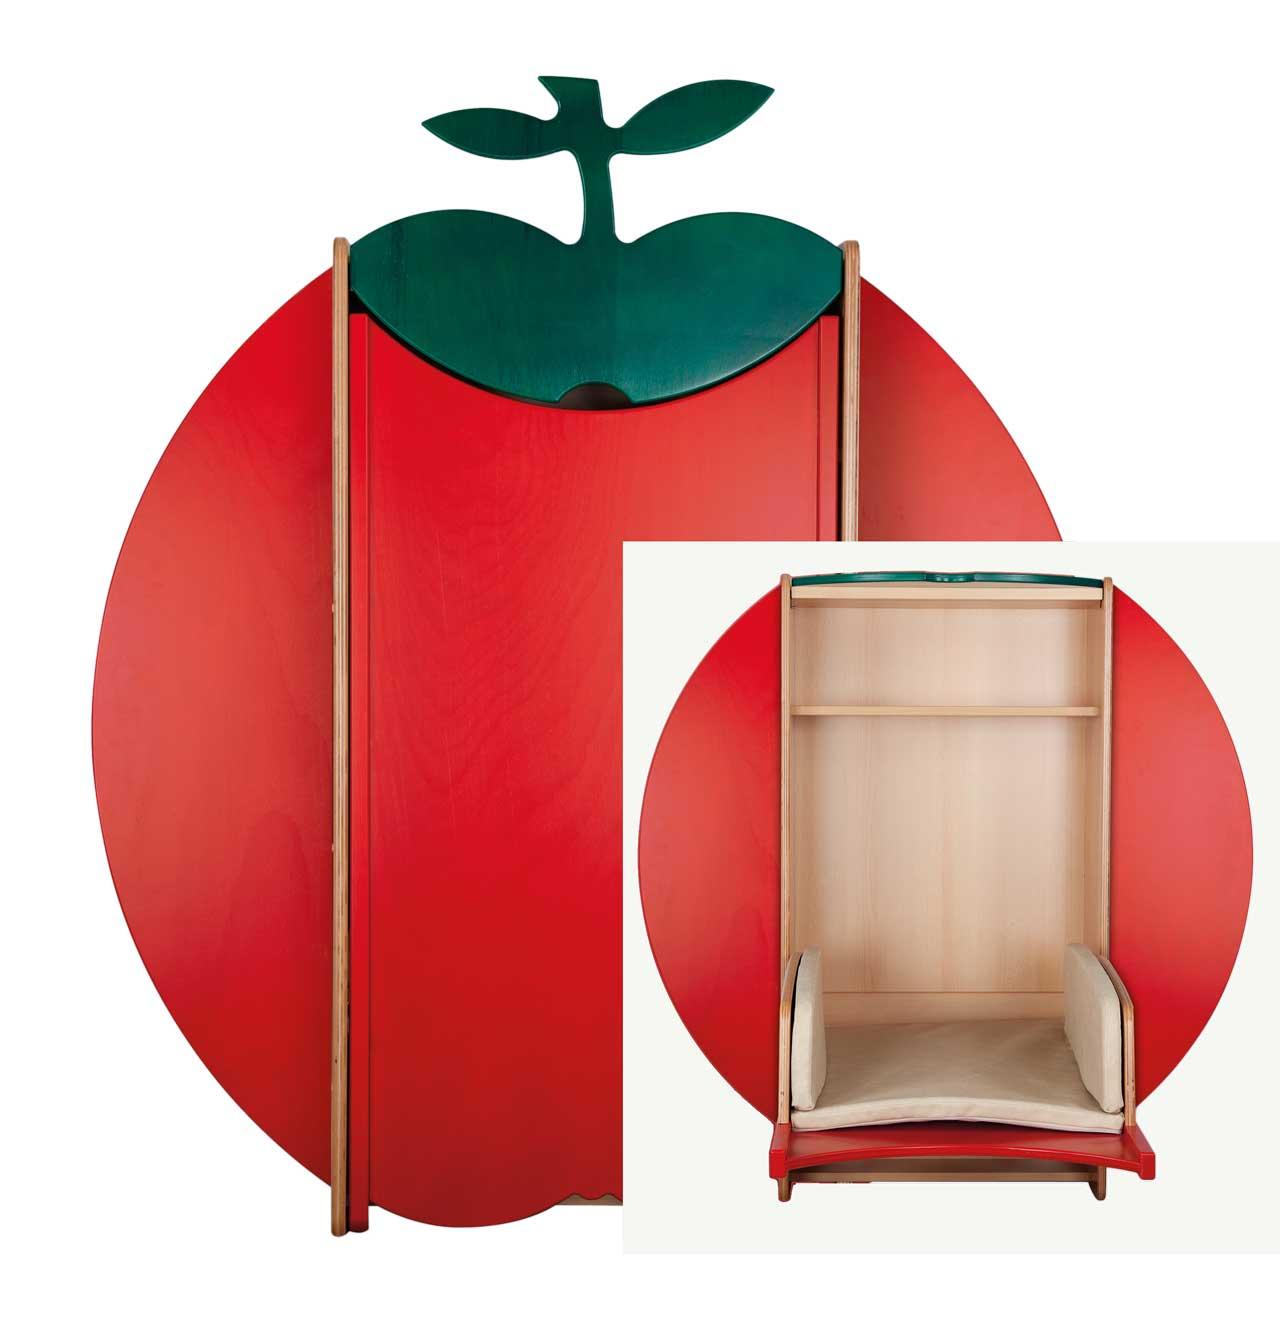 wandwickeltisch gro er wickelapfel kita. Black Bedroom Furniture Sets. Home Design Ideas